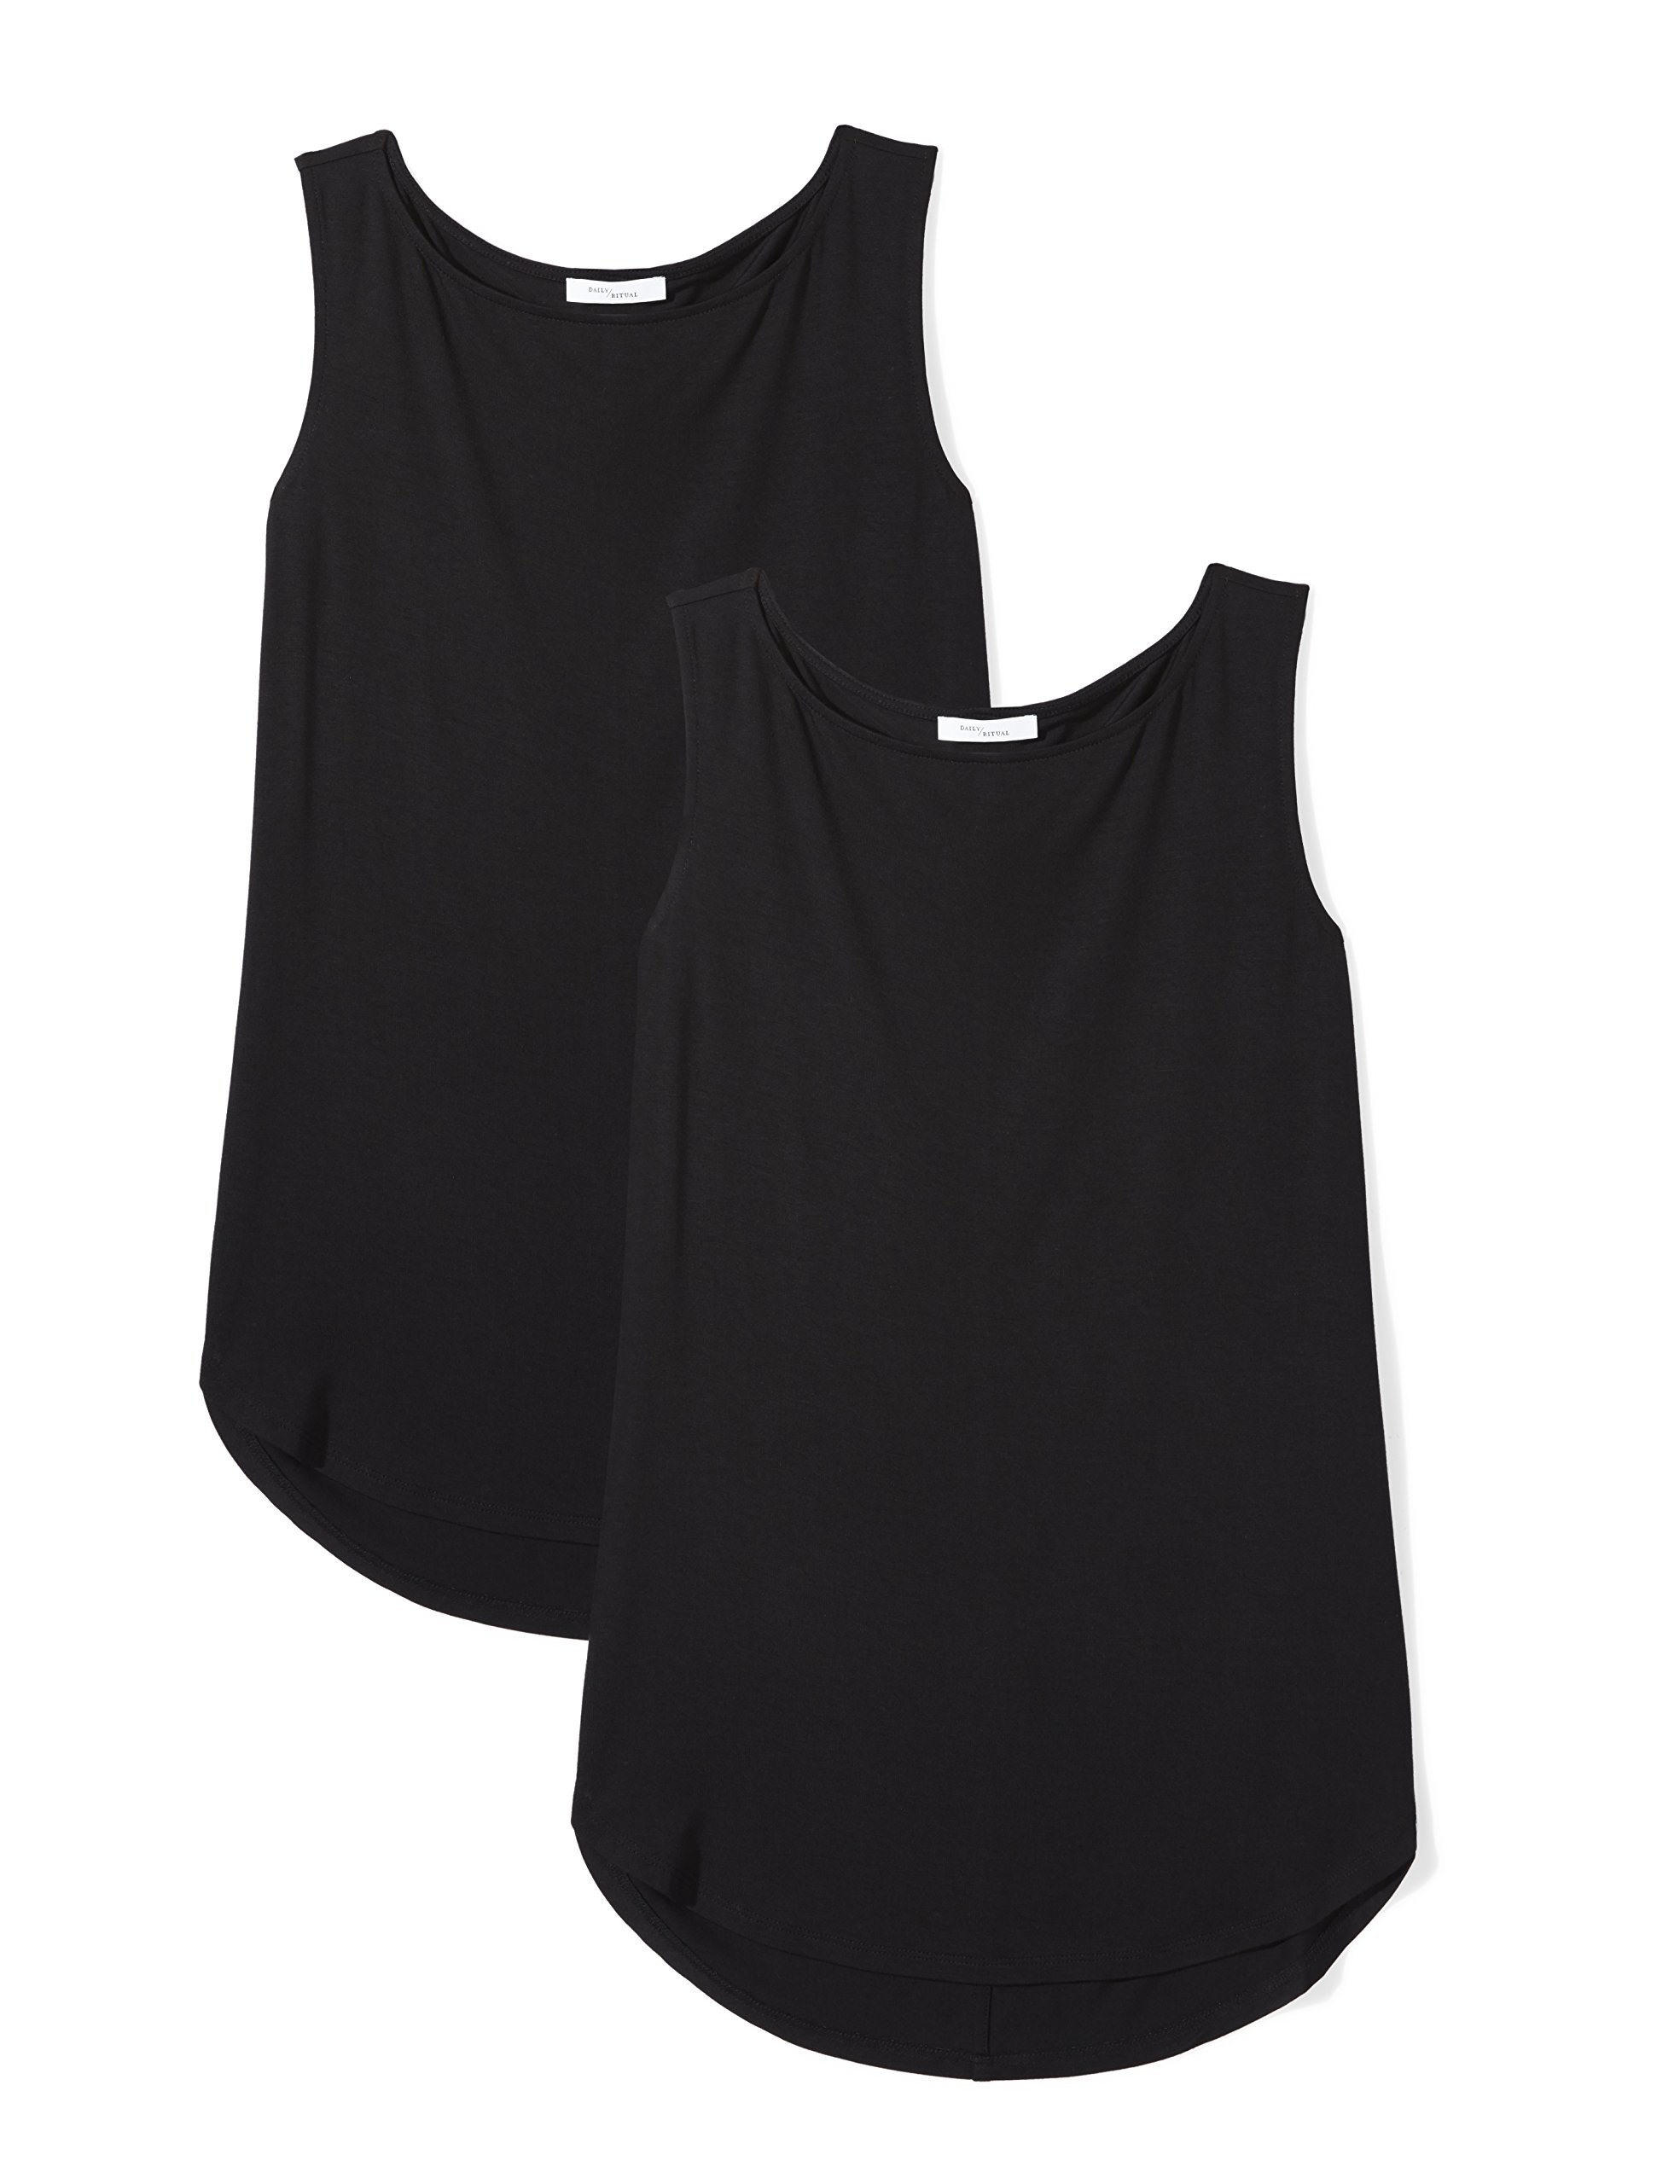 Amazon Brand - Daily Ritual Women's Jersey Bateau-Neck Tank Top